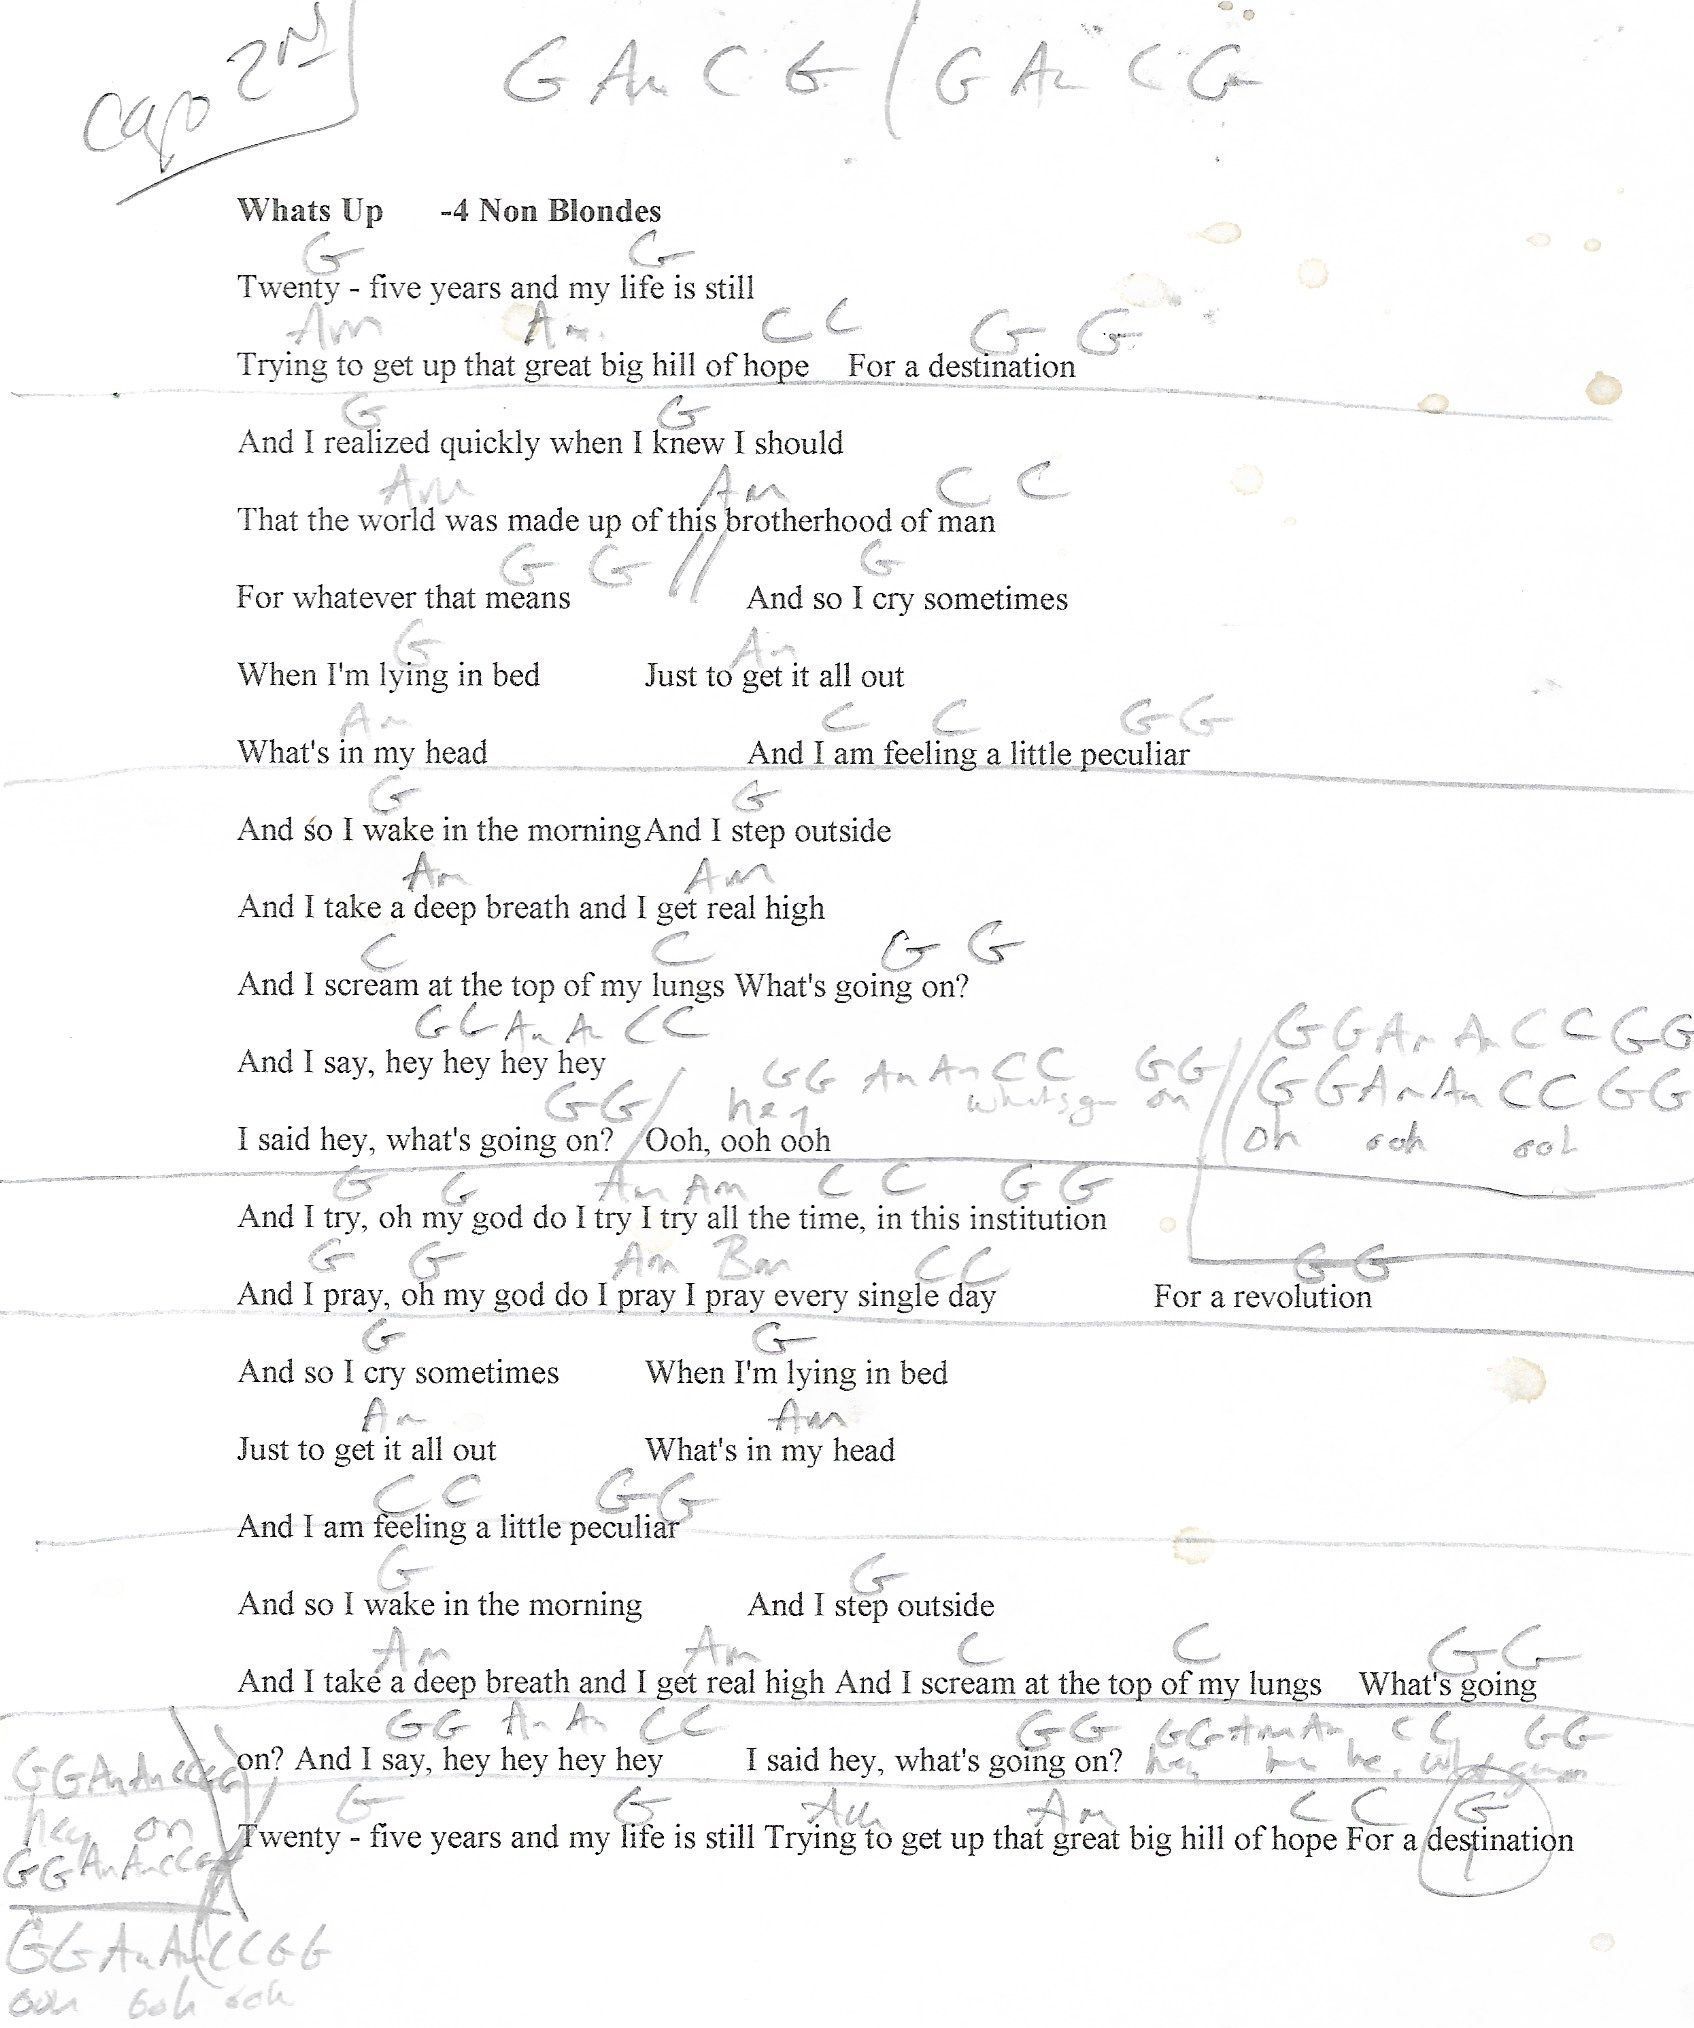 A Thousand Years Christina Perri Capo 3rd Guitar Chord Chart